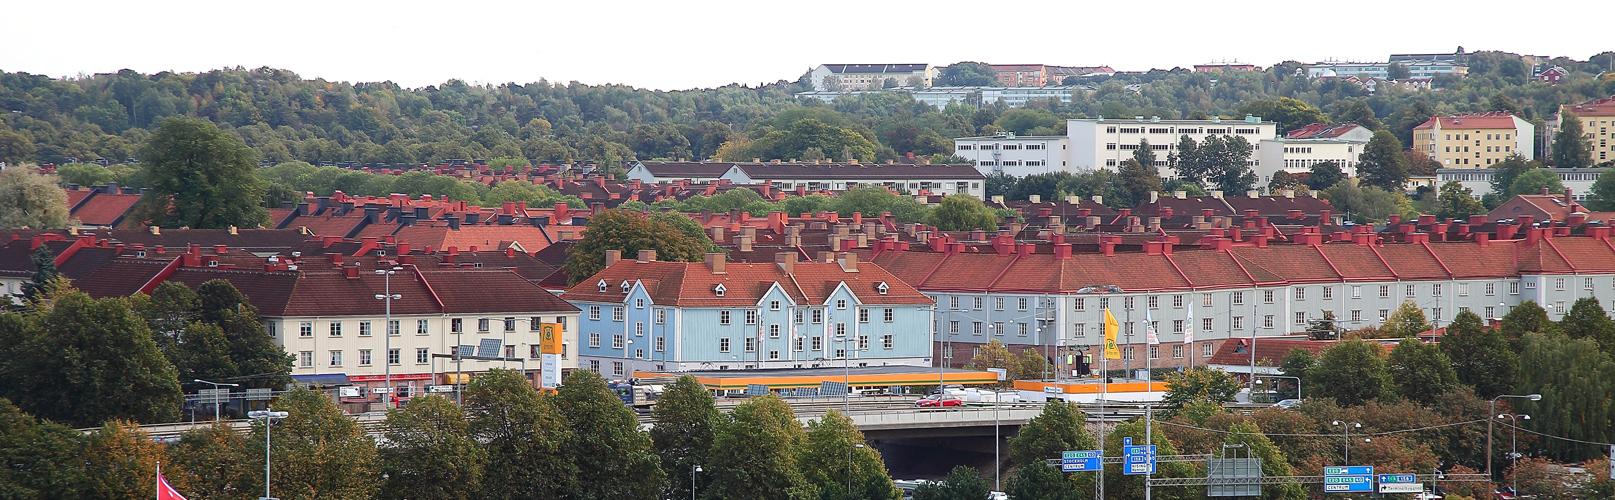 Göteborg-004